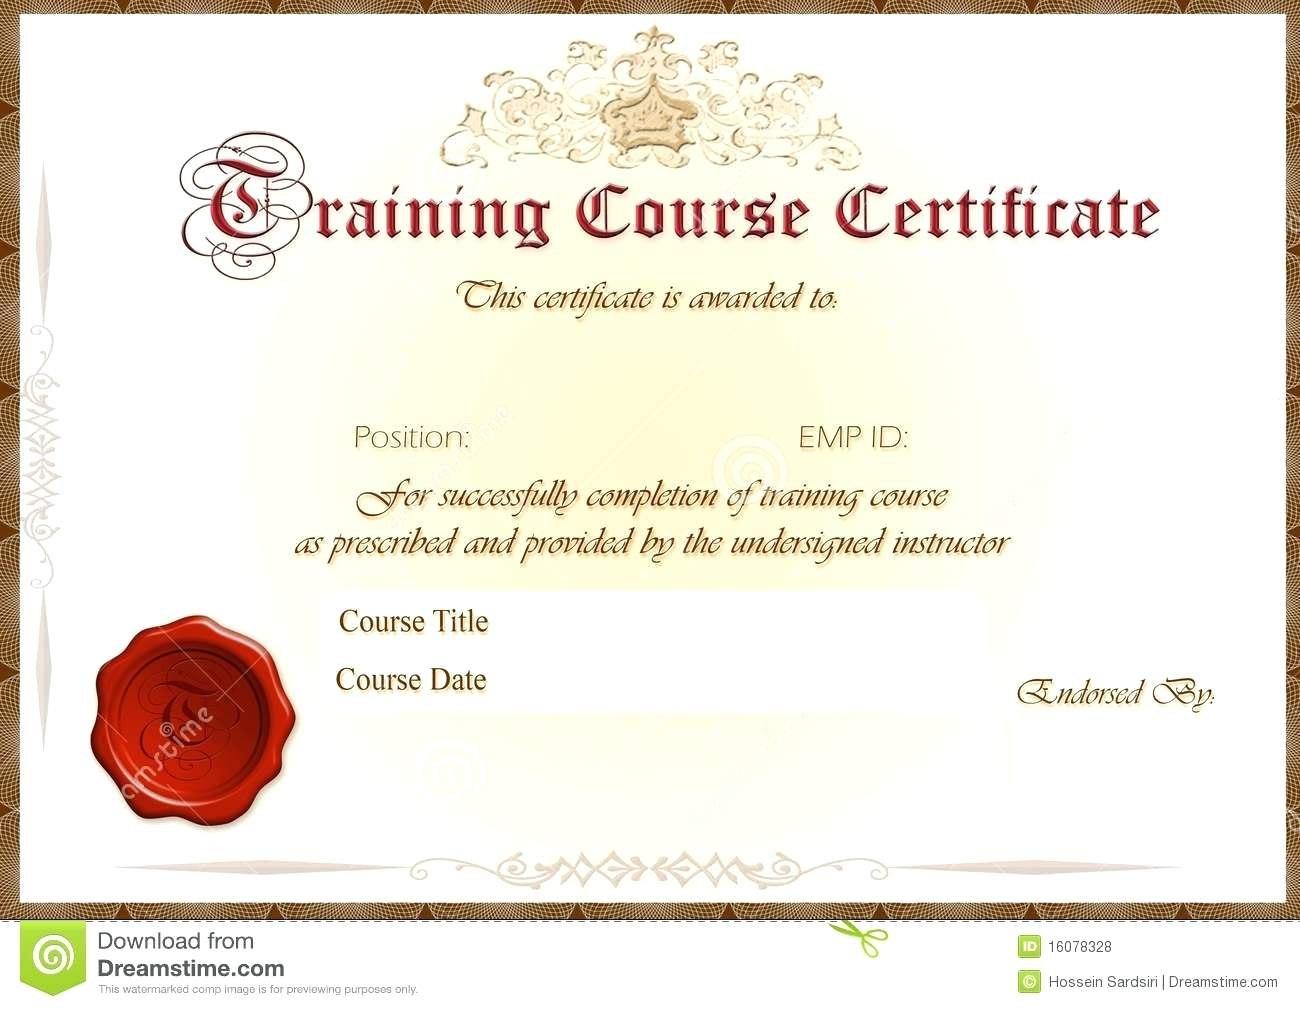 Template Training Certificate Template Fire Extinguisher Word With Inside Fire Extinguisher Certificate Template